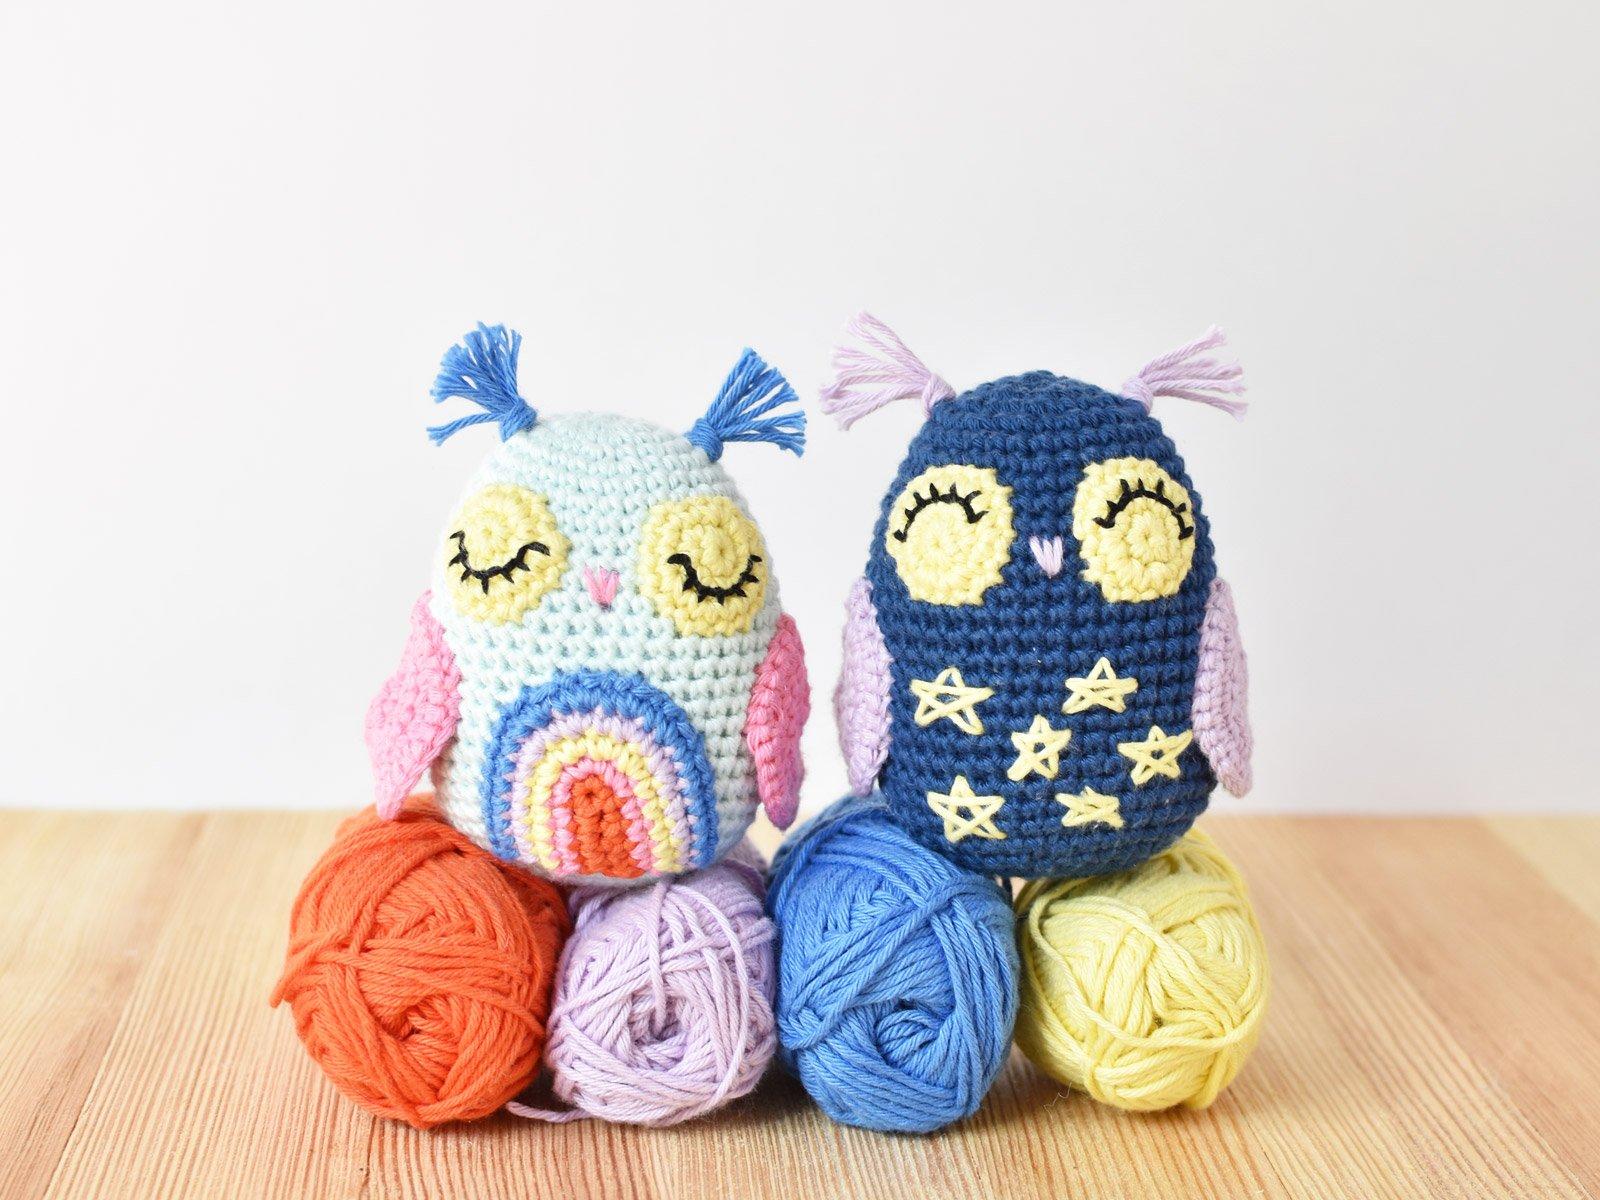 Day & Night Owl Amigurumi sit o top of 4 balls of Ricorumi dk weight yarn